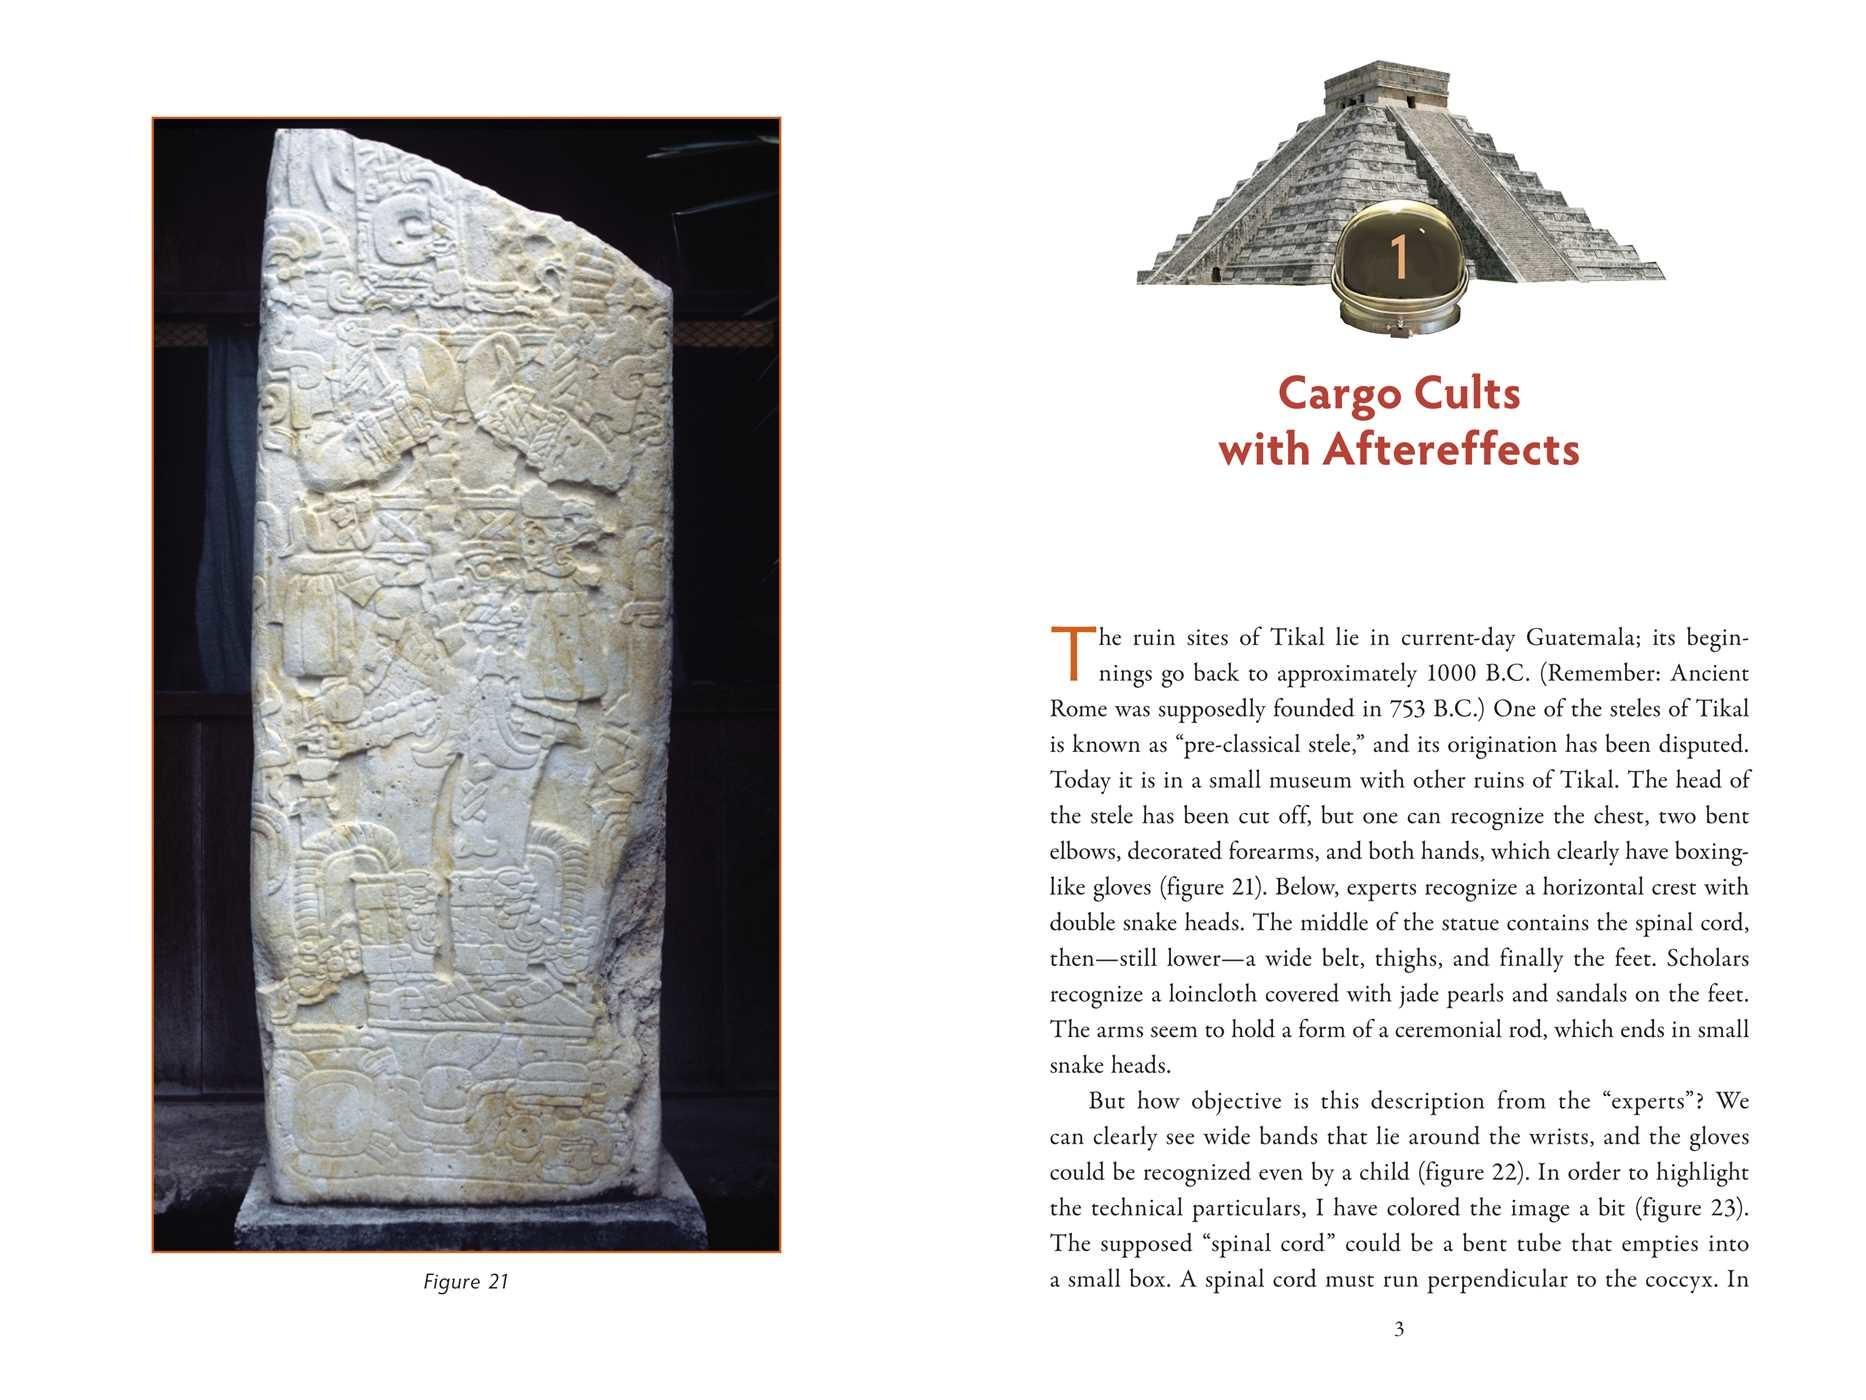 Astronaut gods of the maya 9781591432357.in01